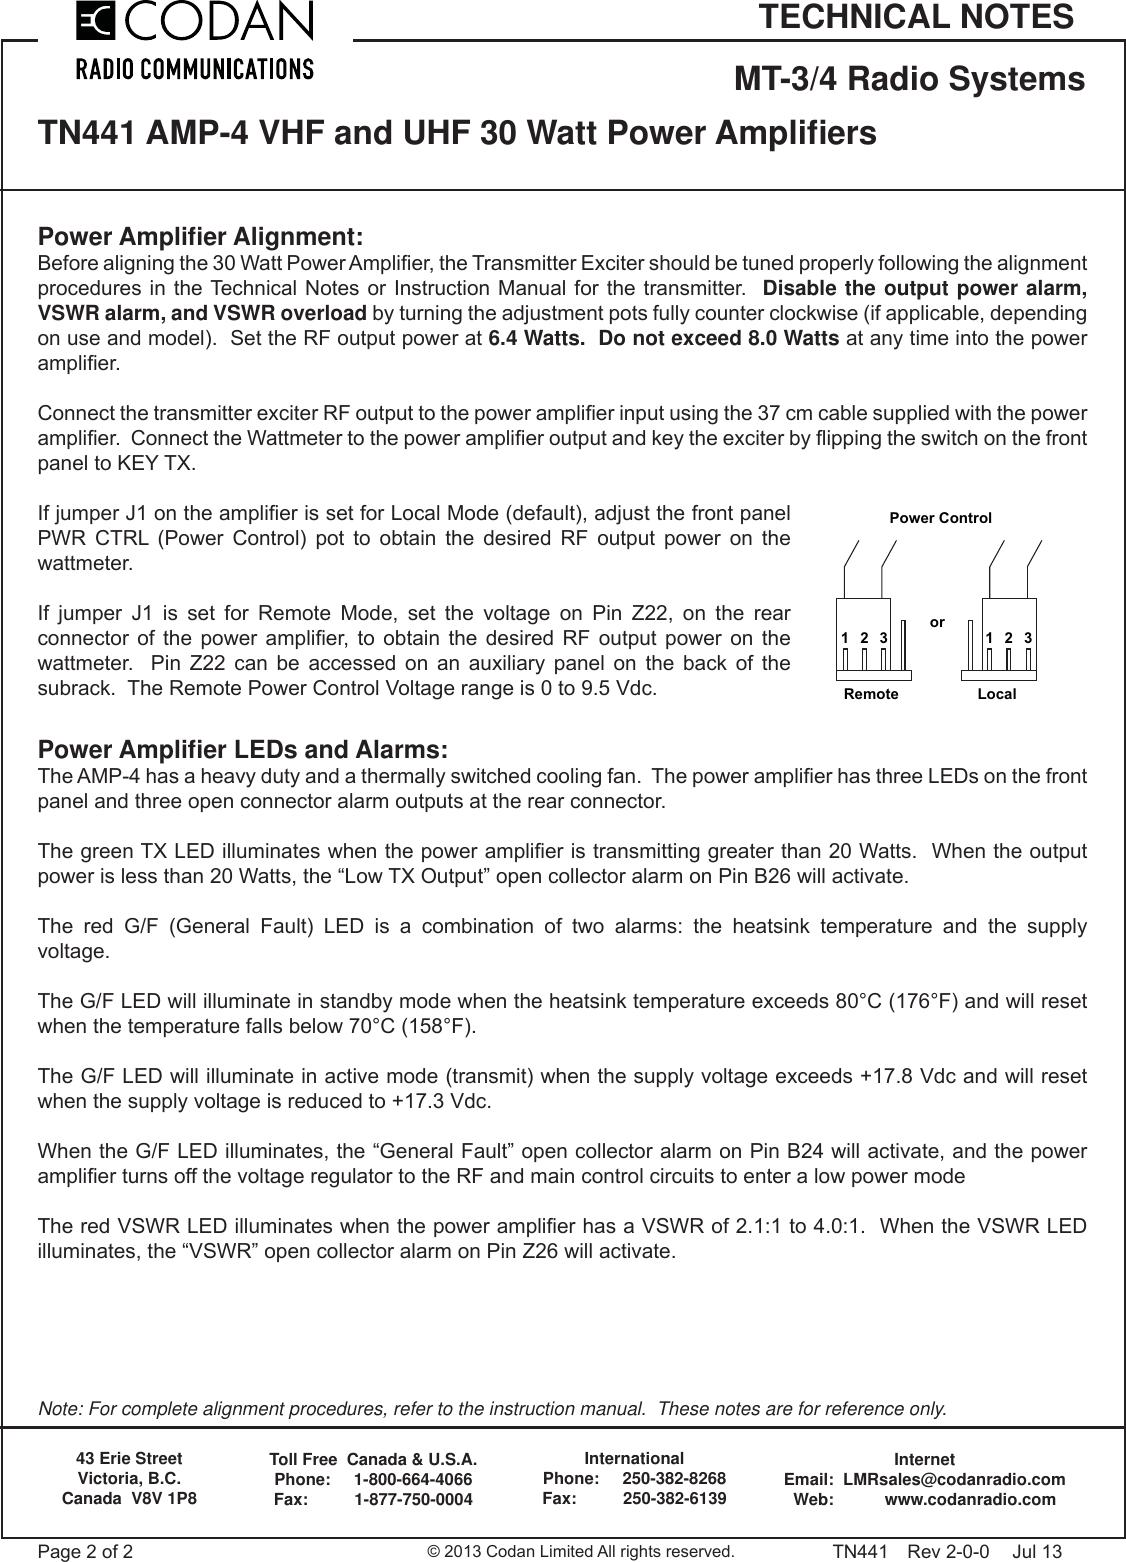 TN441 2 AMP 4 Power Amplifiers VHF And UHF 30 Watt Codan